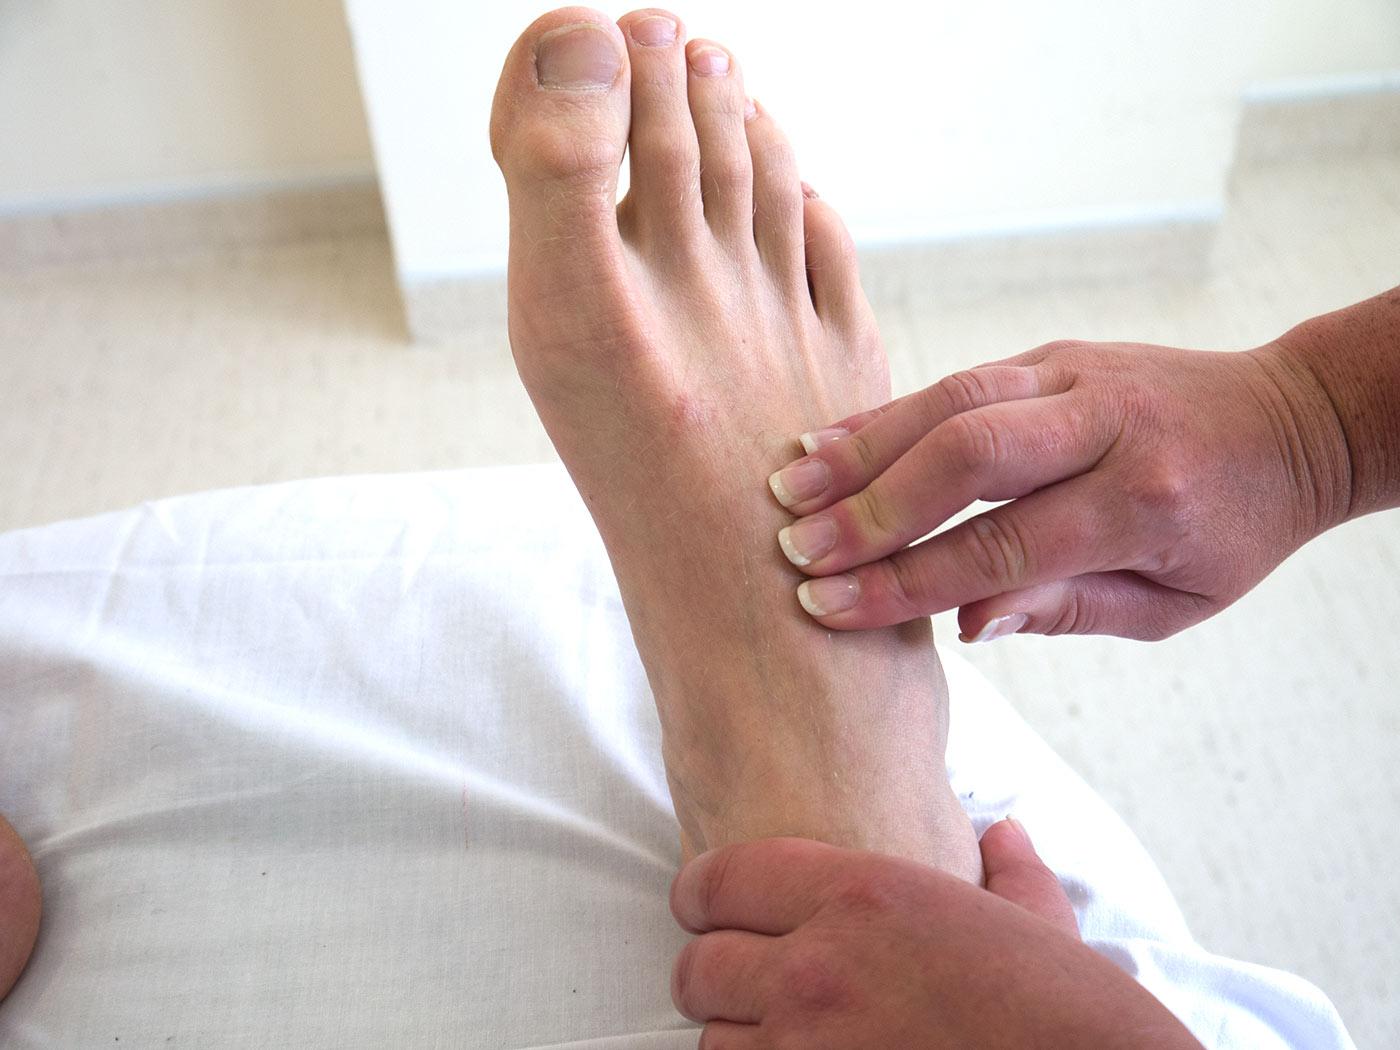 Dorsalis Pedis Artery - Stepwards